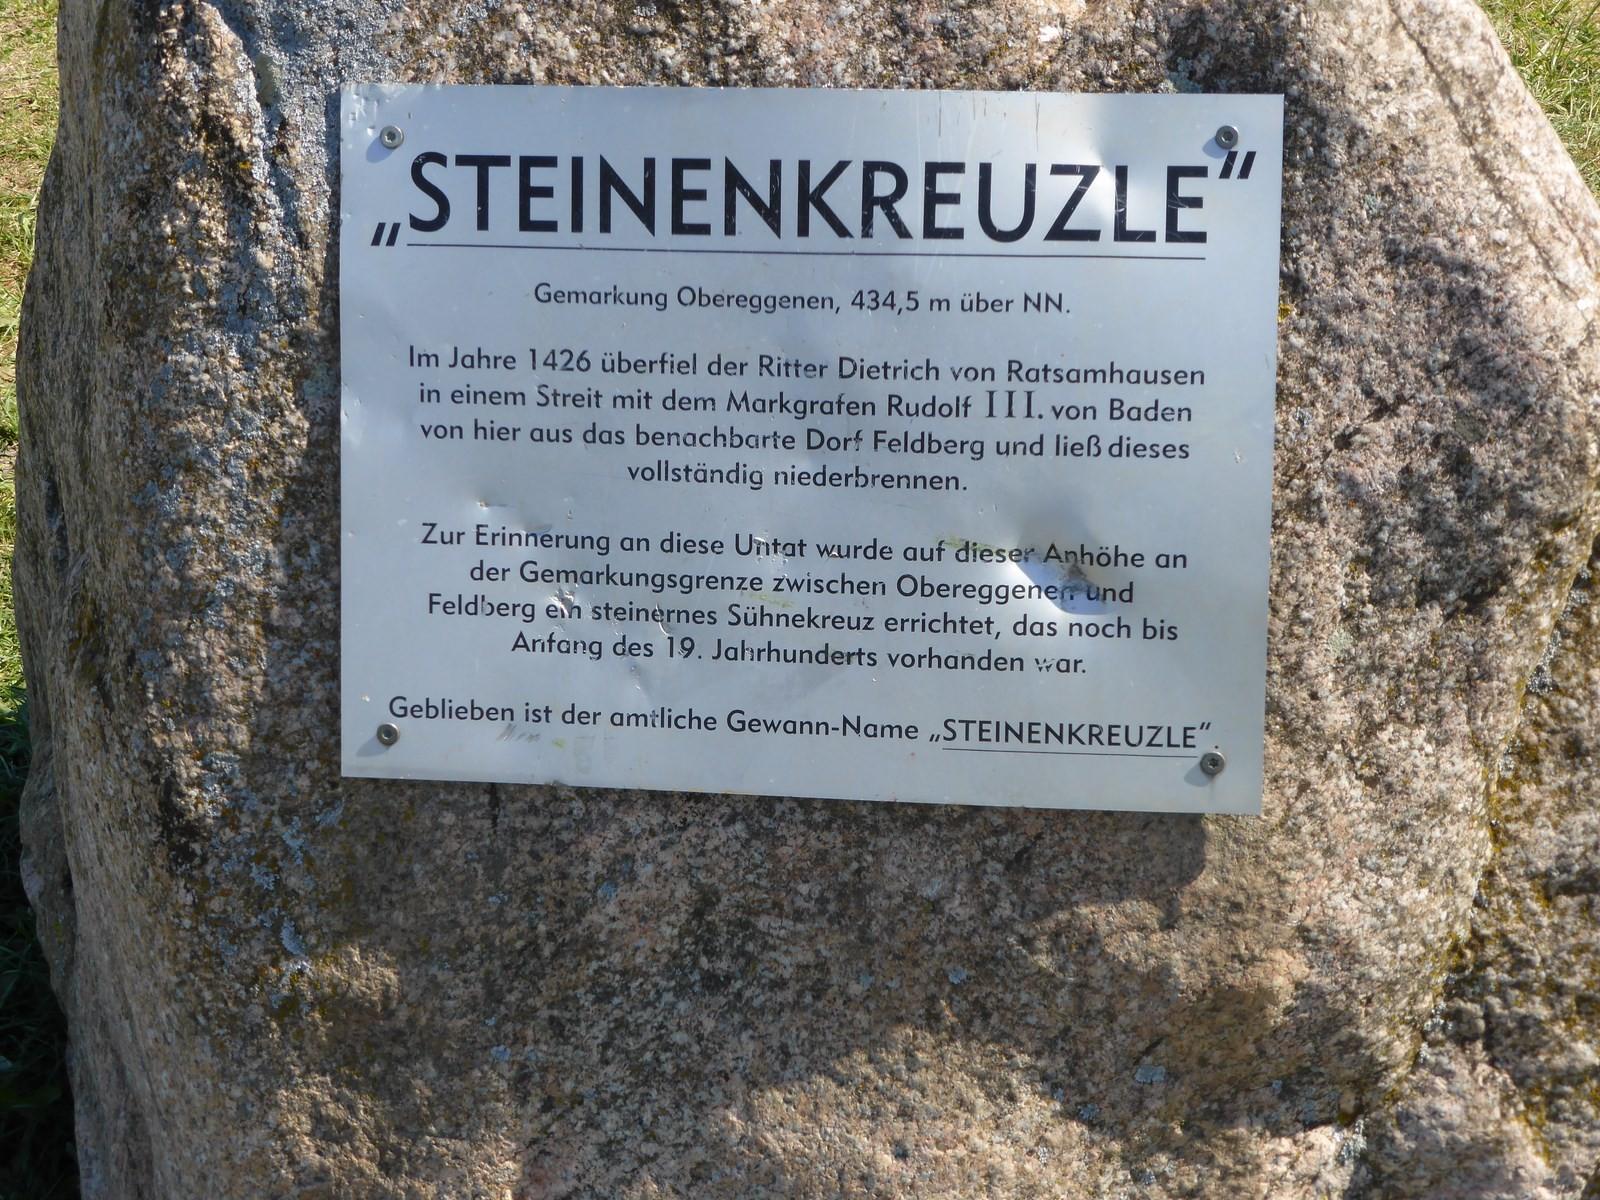 Steinenkreuzle © Hartmut Hermanns